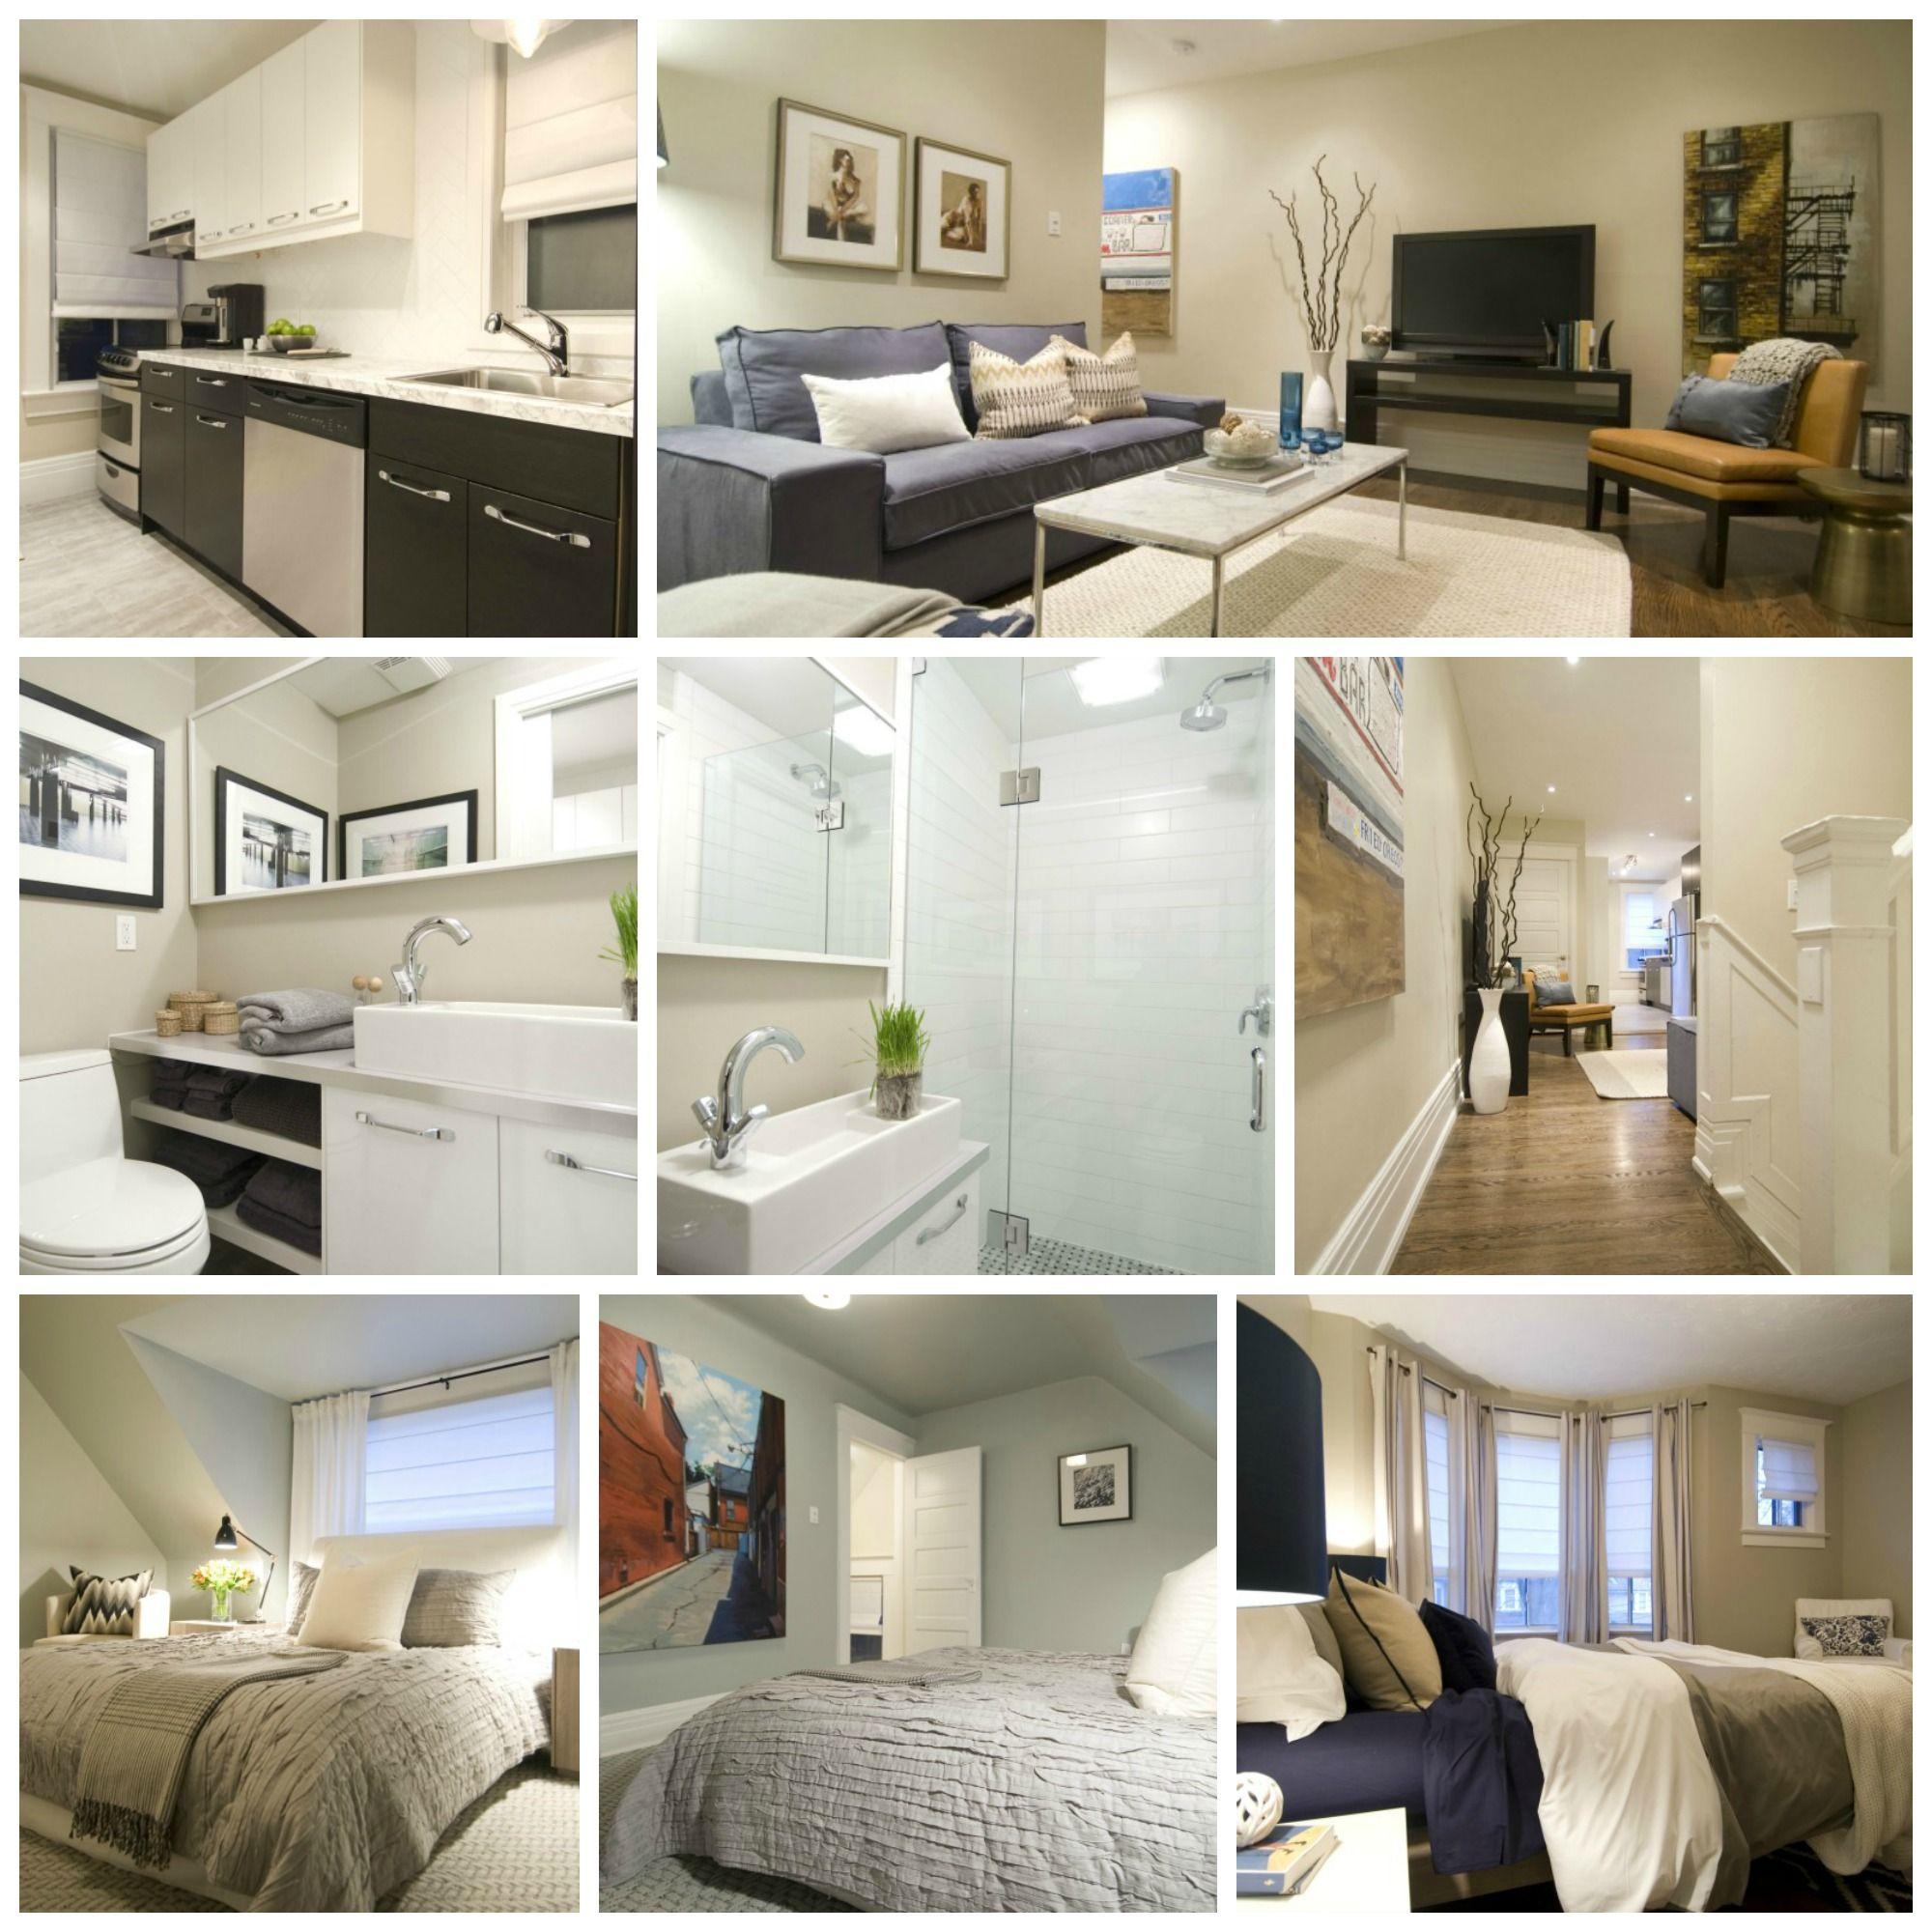 Studio Apartment Kitchen Design Basement Studio Apartment: Income Property